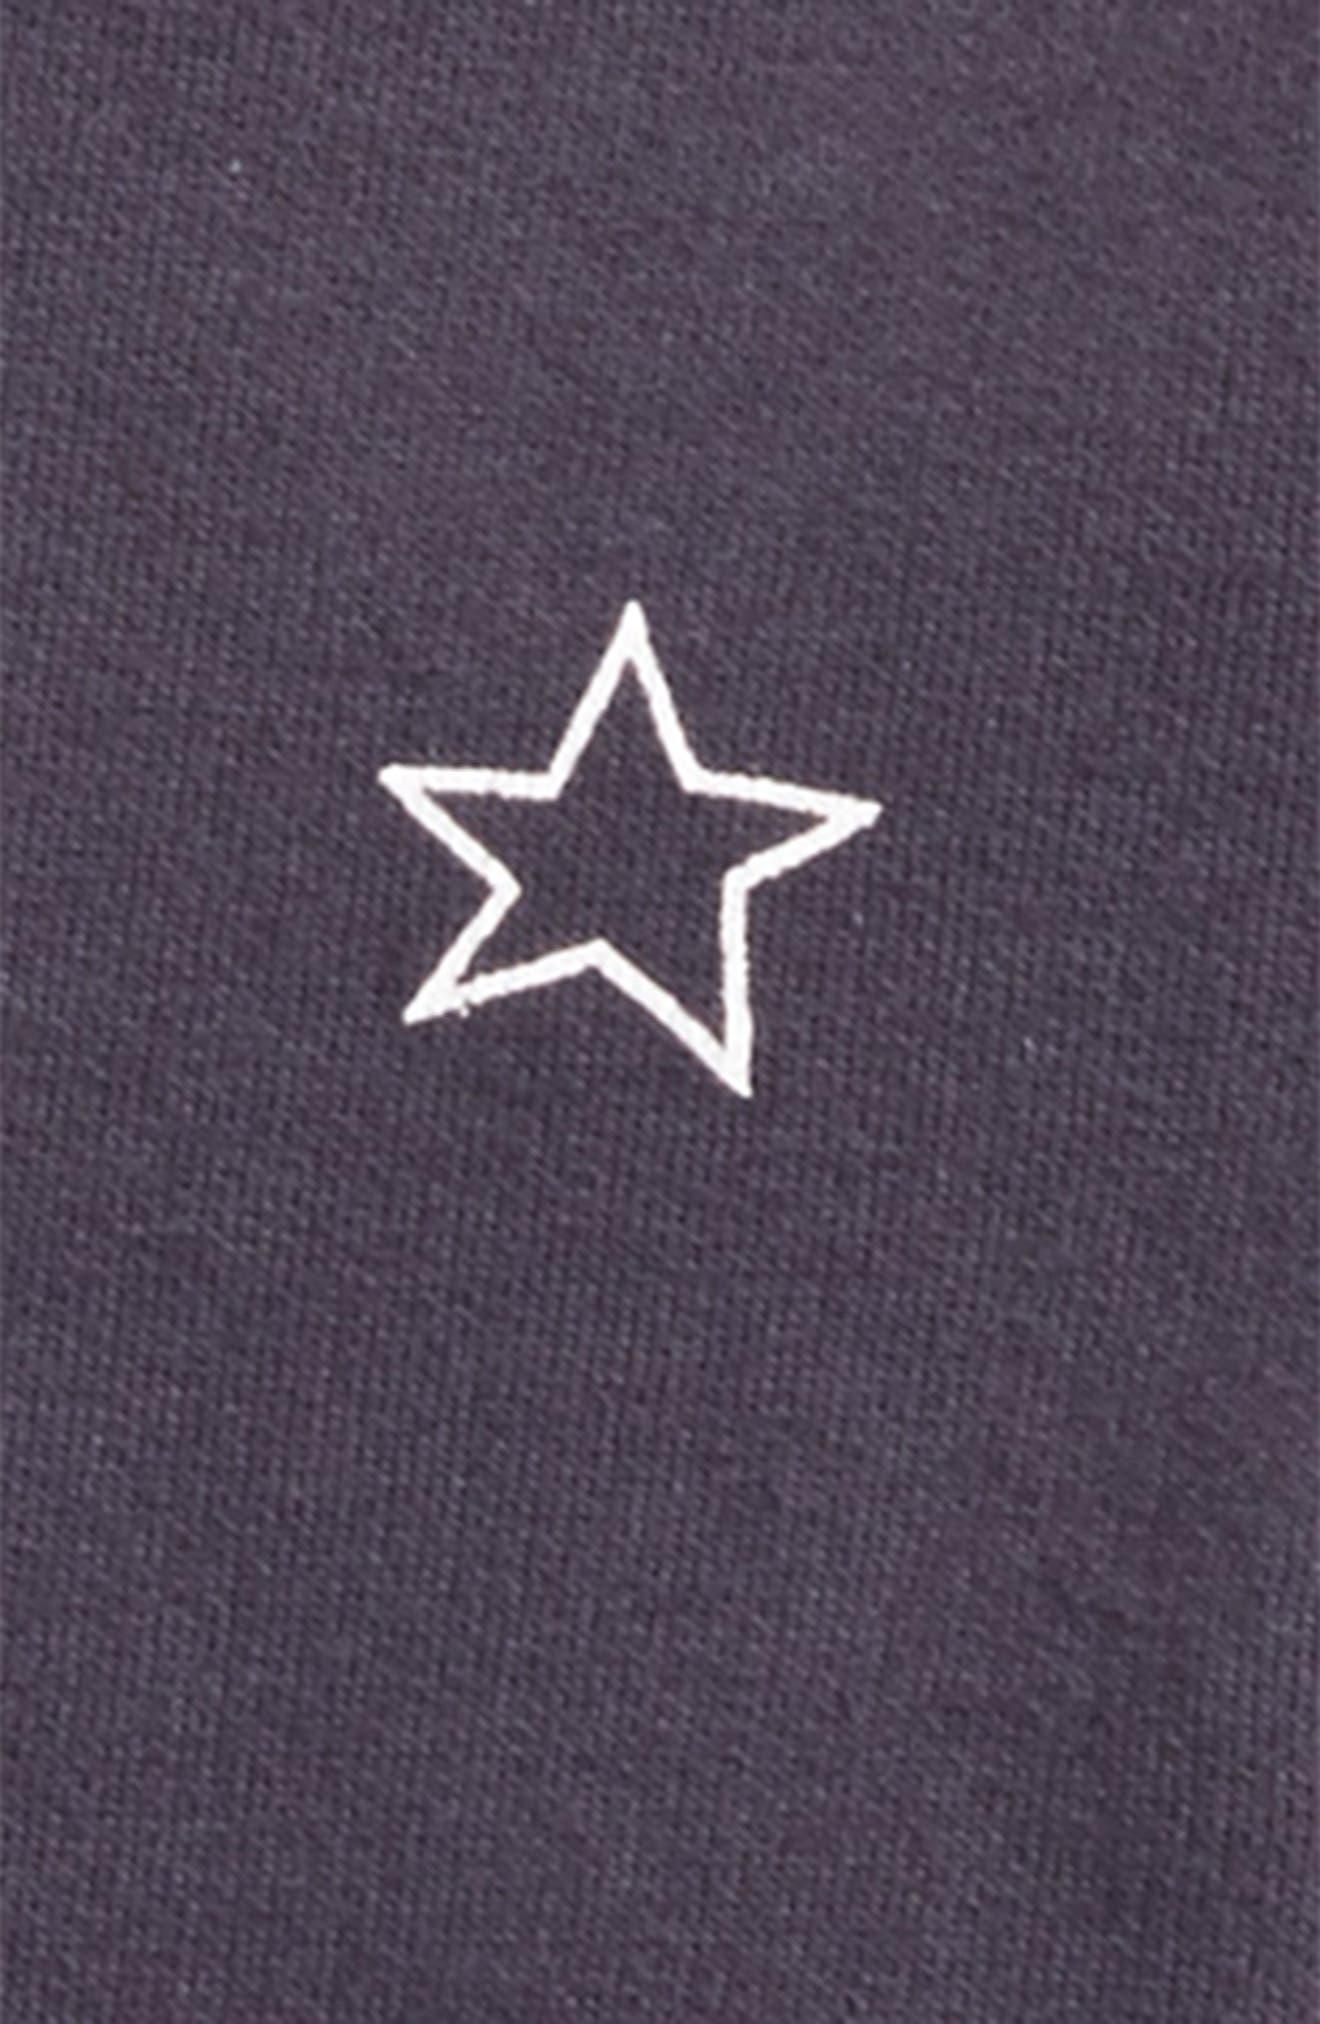 Star Print Baseball Jacket,                             Alternate thumbnail 2, color,                             Night Sky